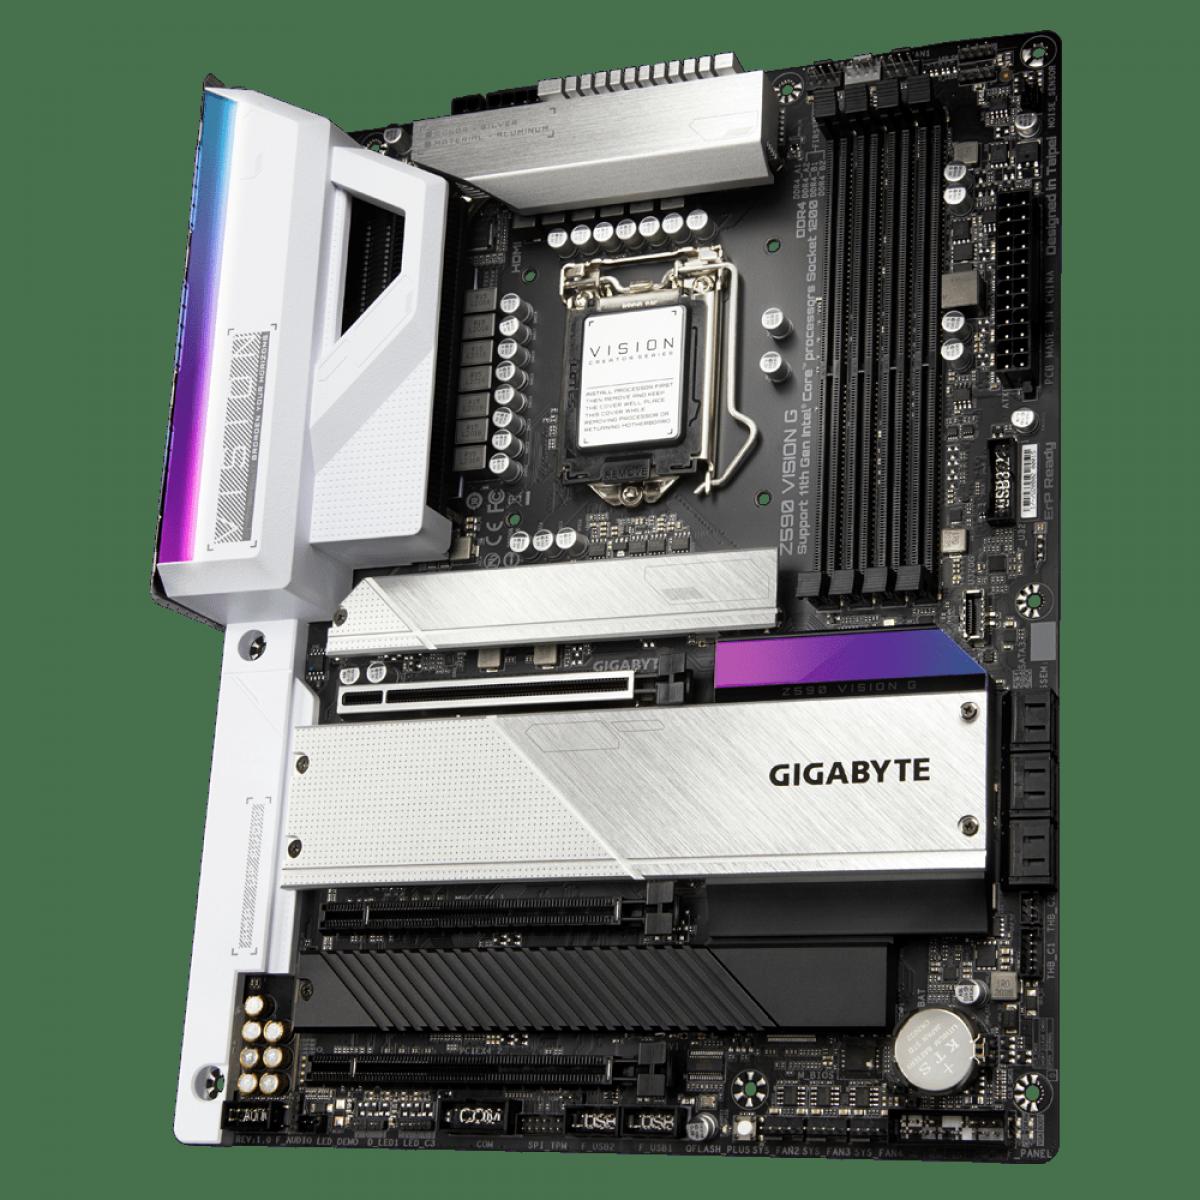 Paca Mãe GIGABYTE Z590 VISION G (rev. 1.0), Intel Z590 Express Chipset, Socket 1200, ATX, DDR4